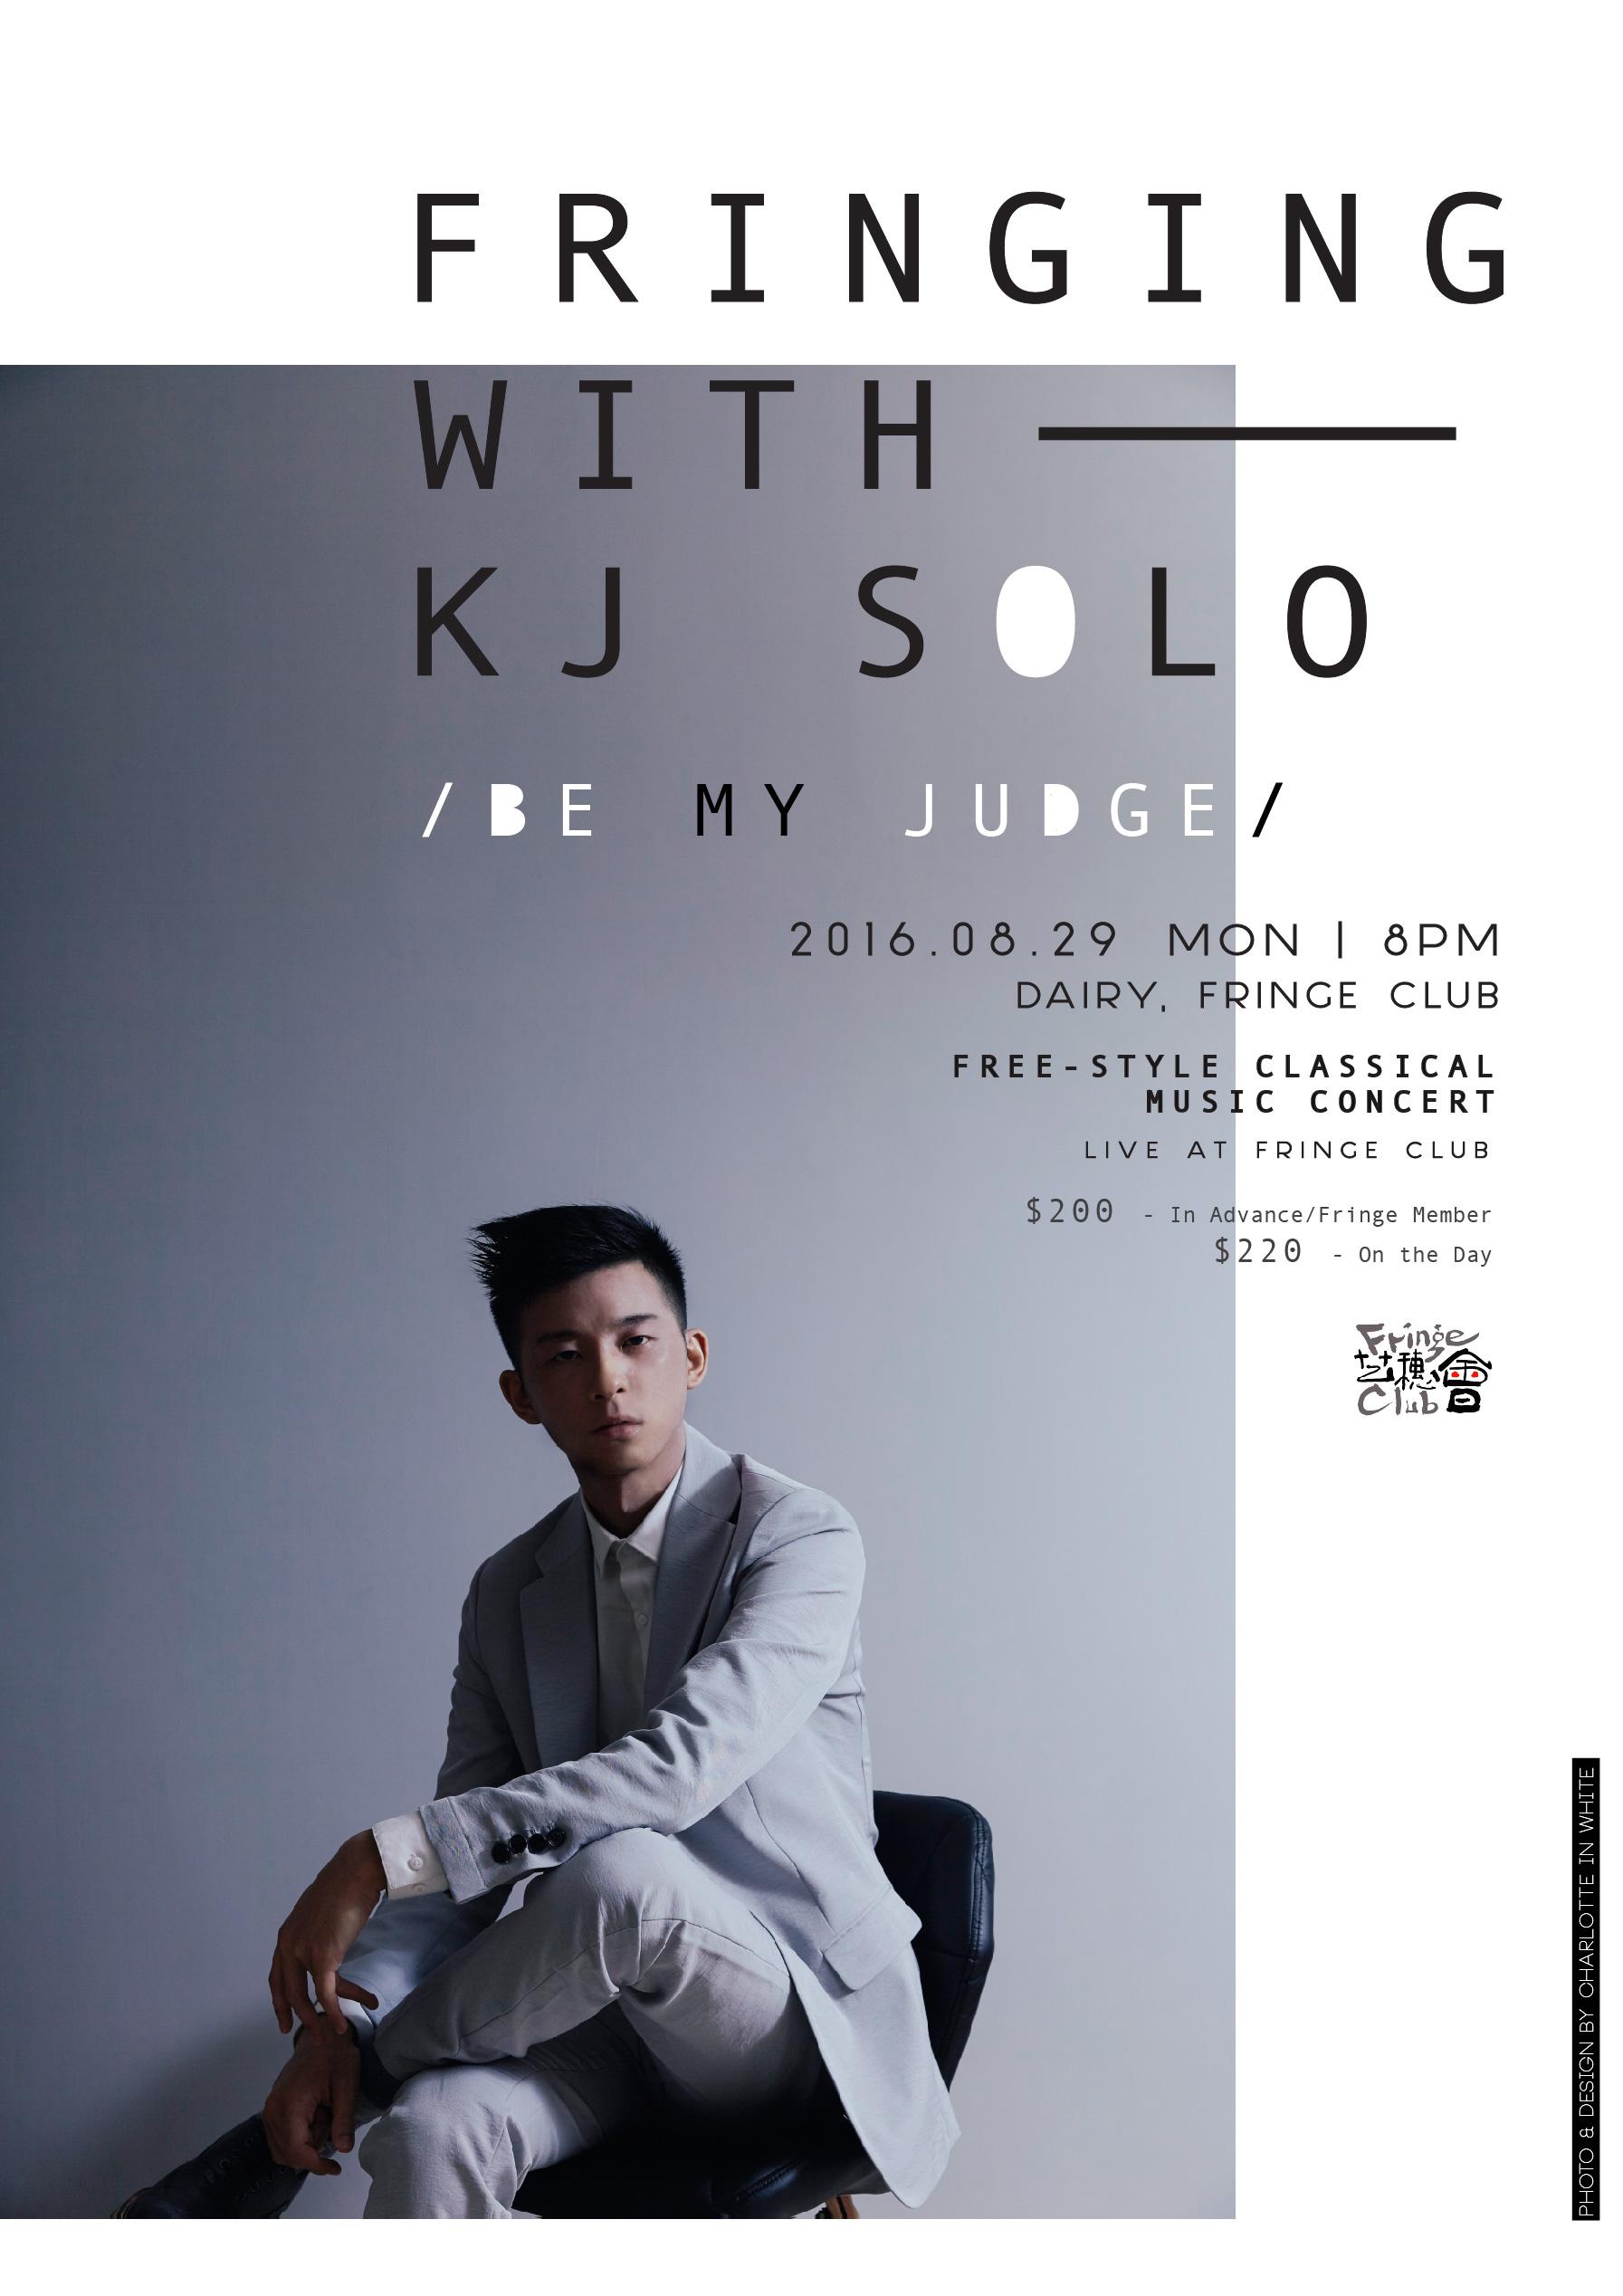 kj's concert series - Creative Direction . Photography . Graphic Design